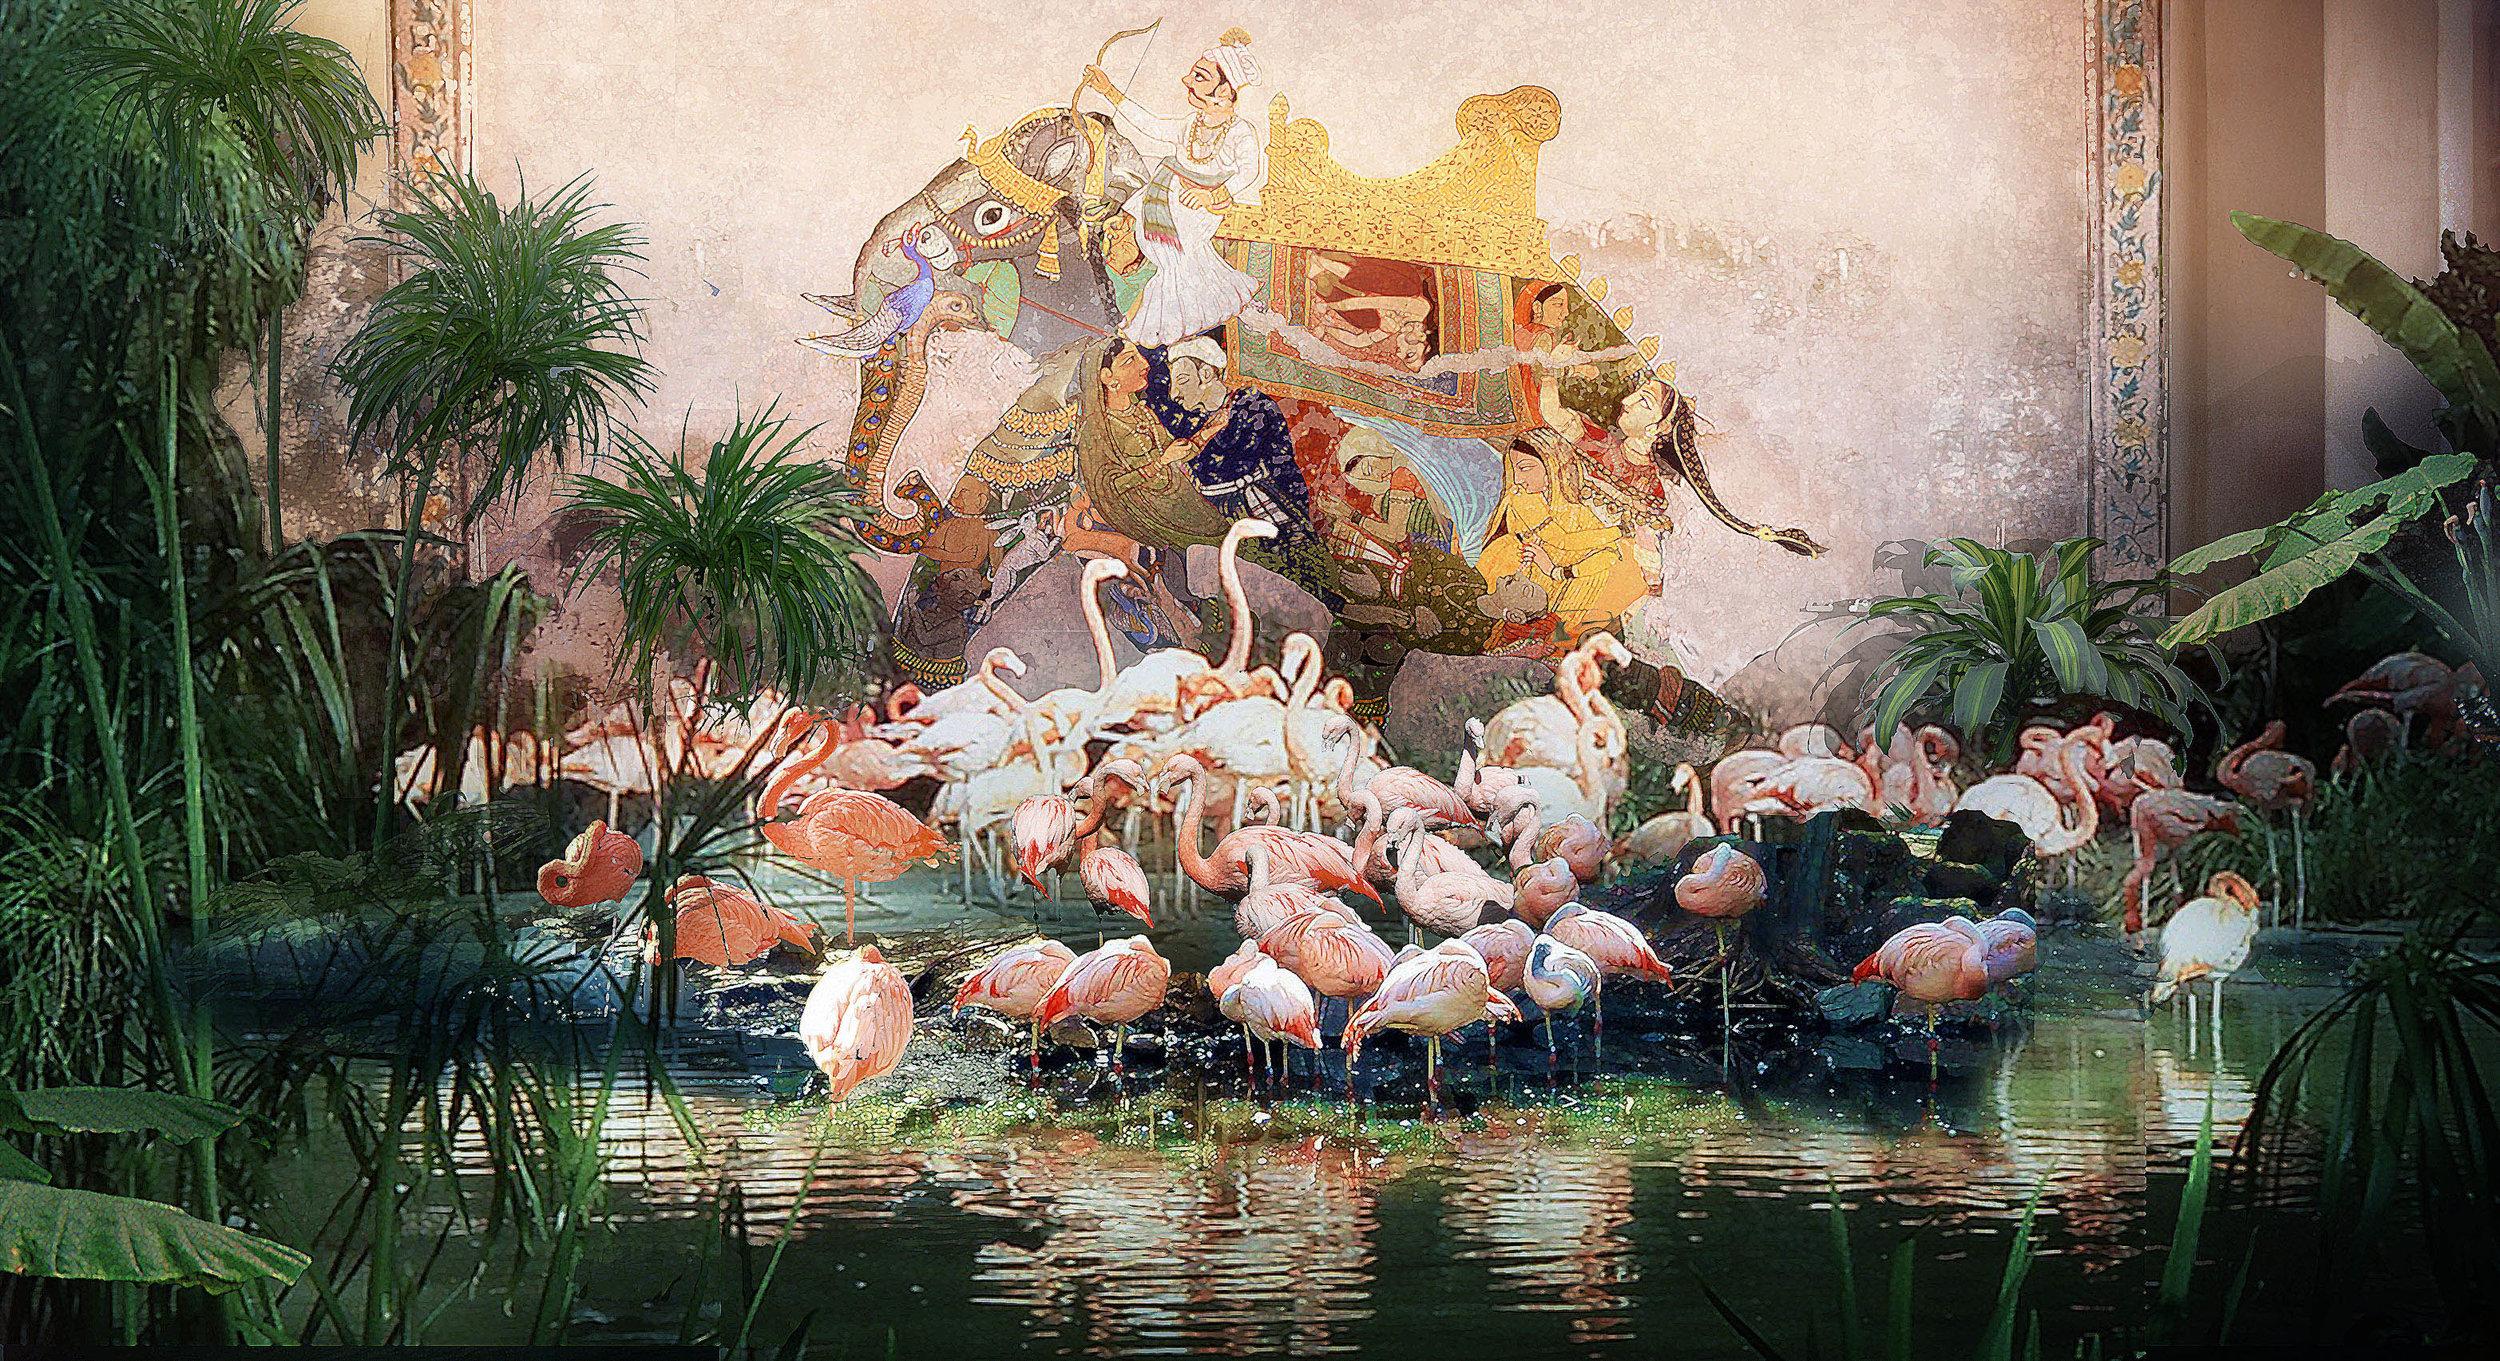 Illustration of Flamingo Exhibit